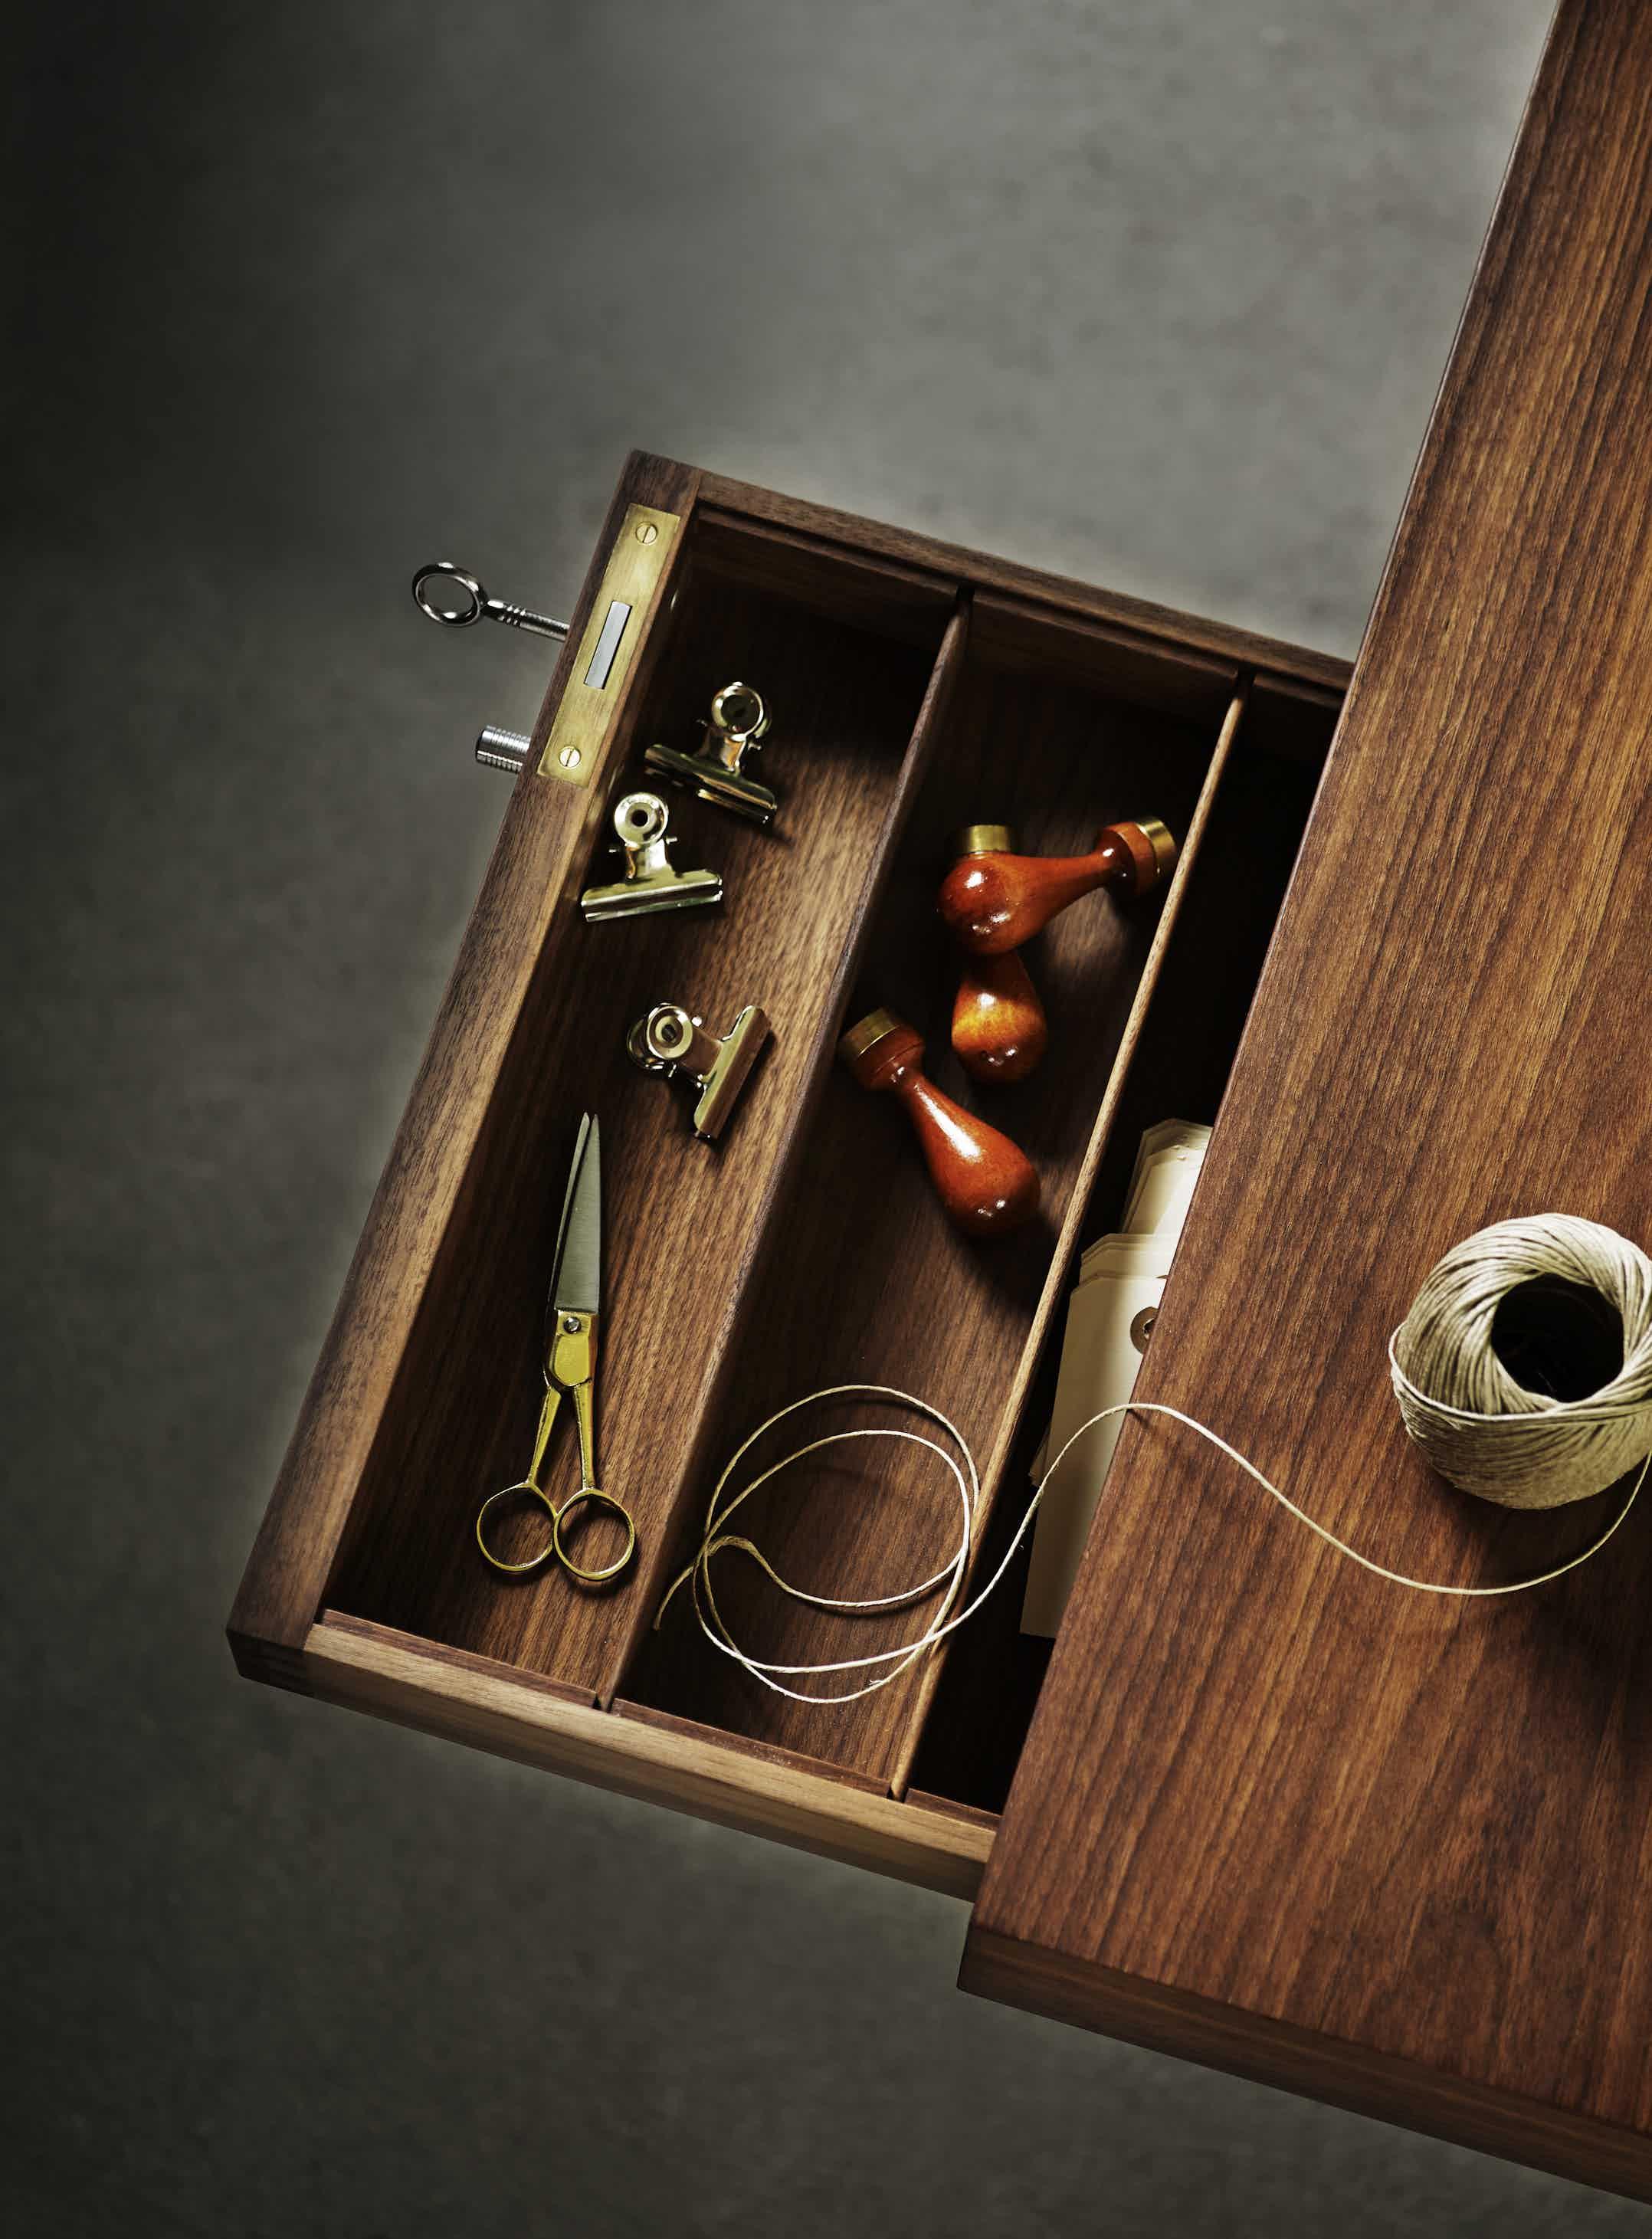 Carl-hansen-son-top-drawer-detail-ch110-institu-haute-living